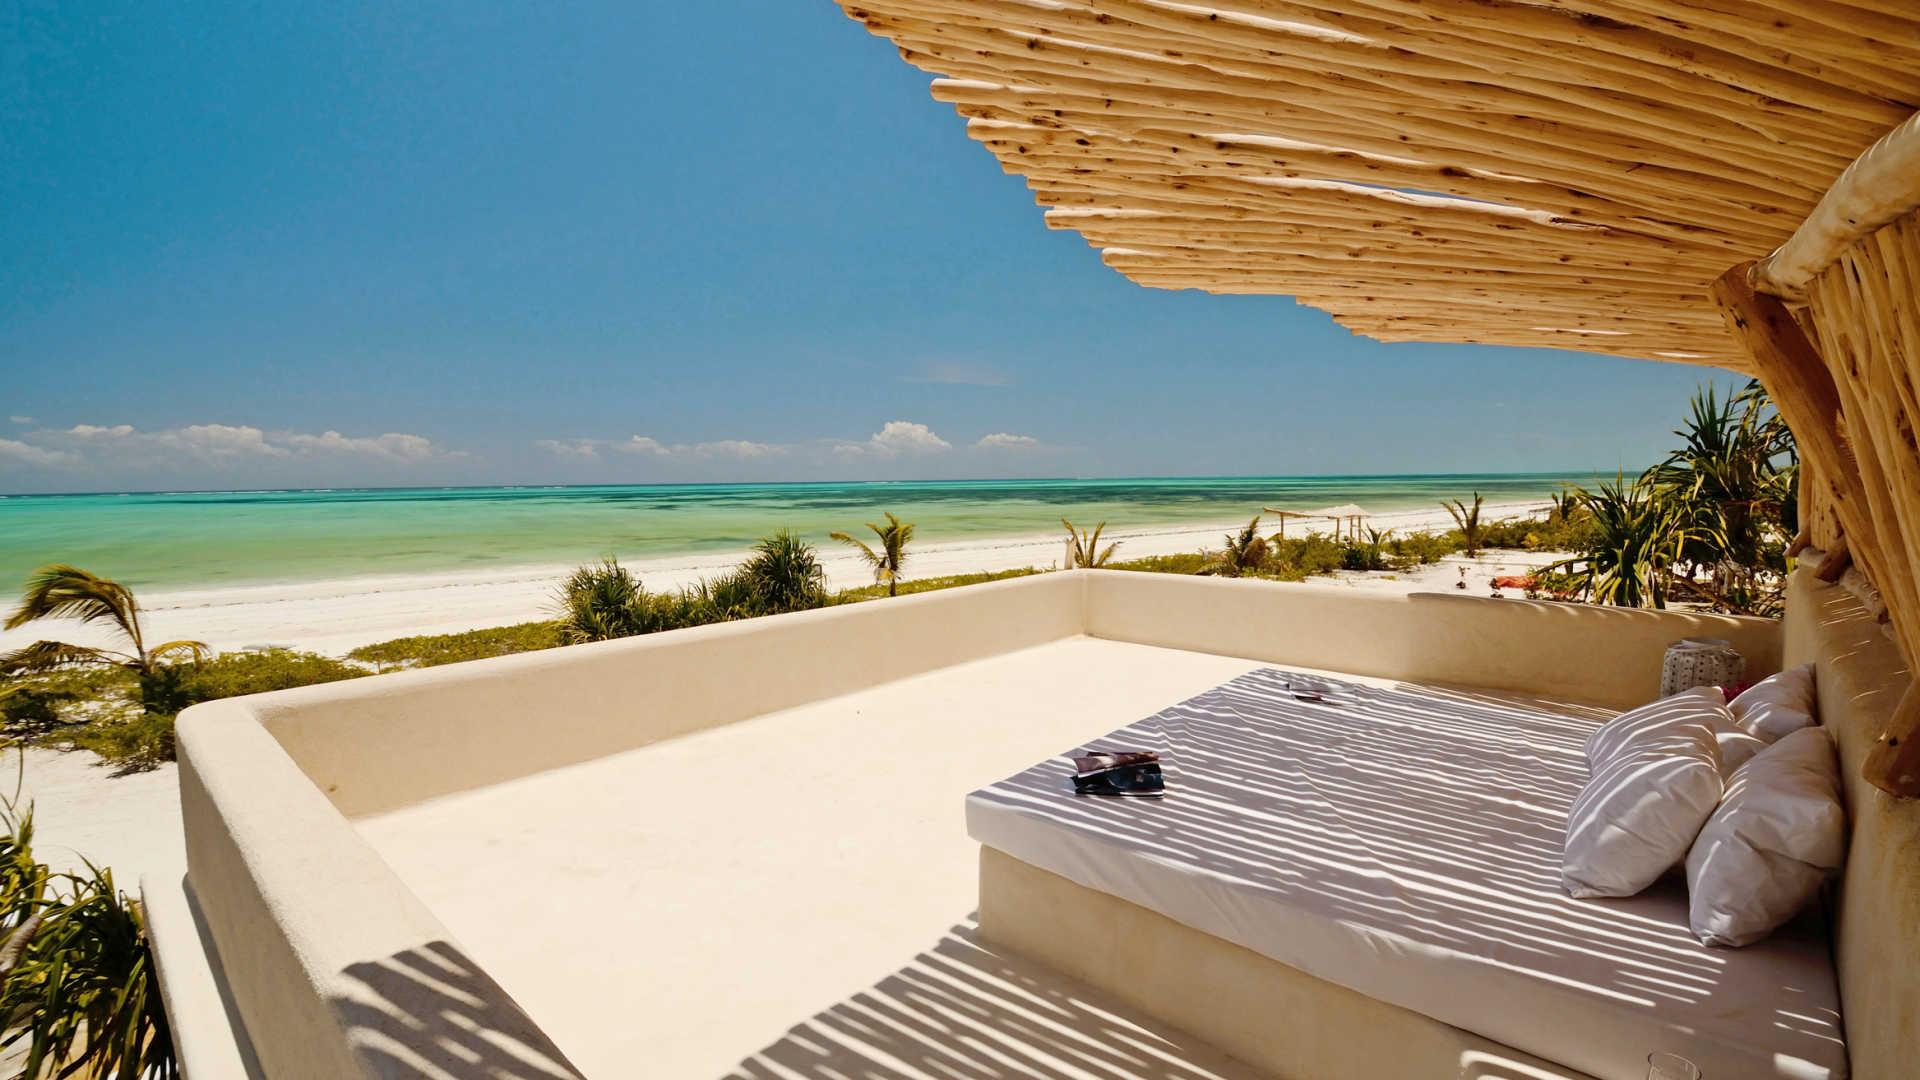 zanzibar-white-sand-luxury-villas-and-spa-34600056-1492015136-ImageGalleryLightboxLarge.jpg